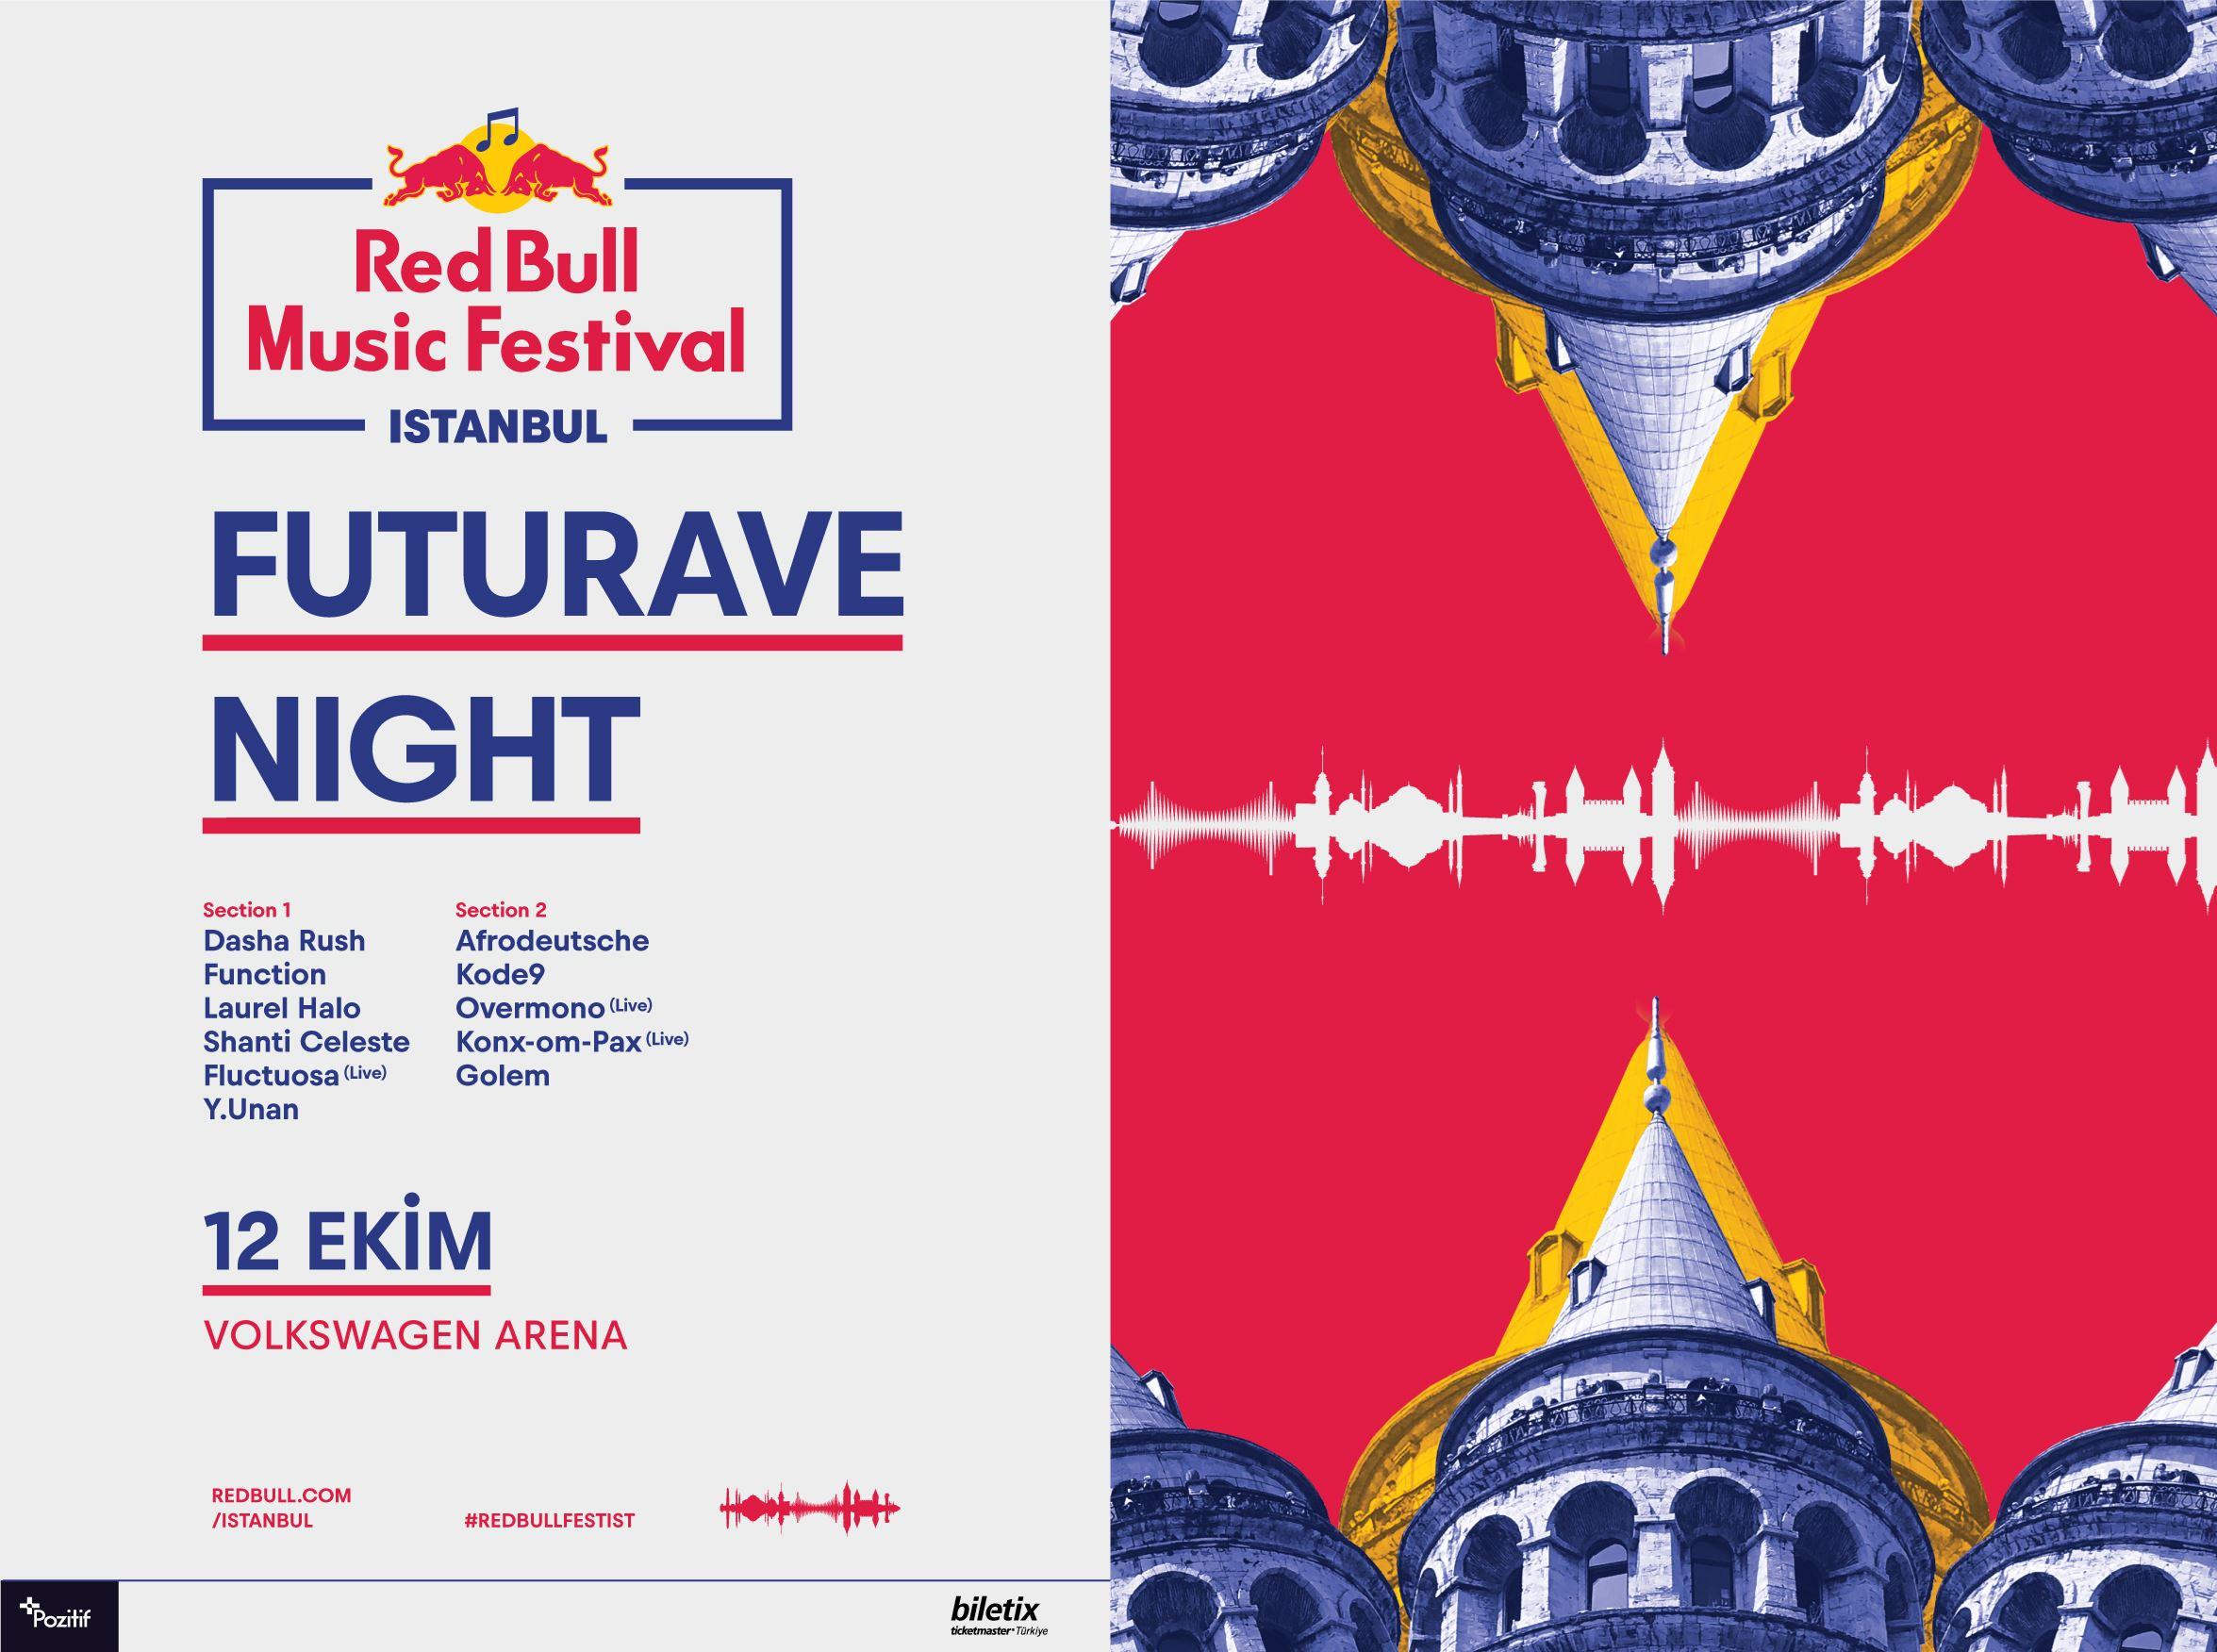 Red Bull Music Festival Istanbul: Futurave Night